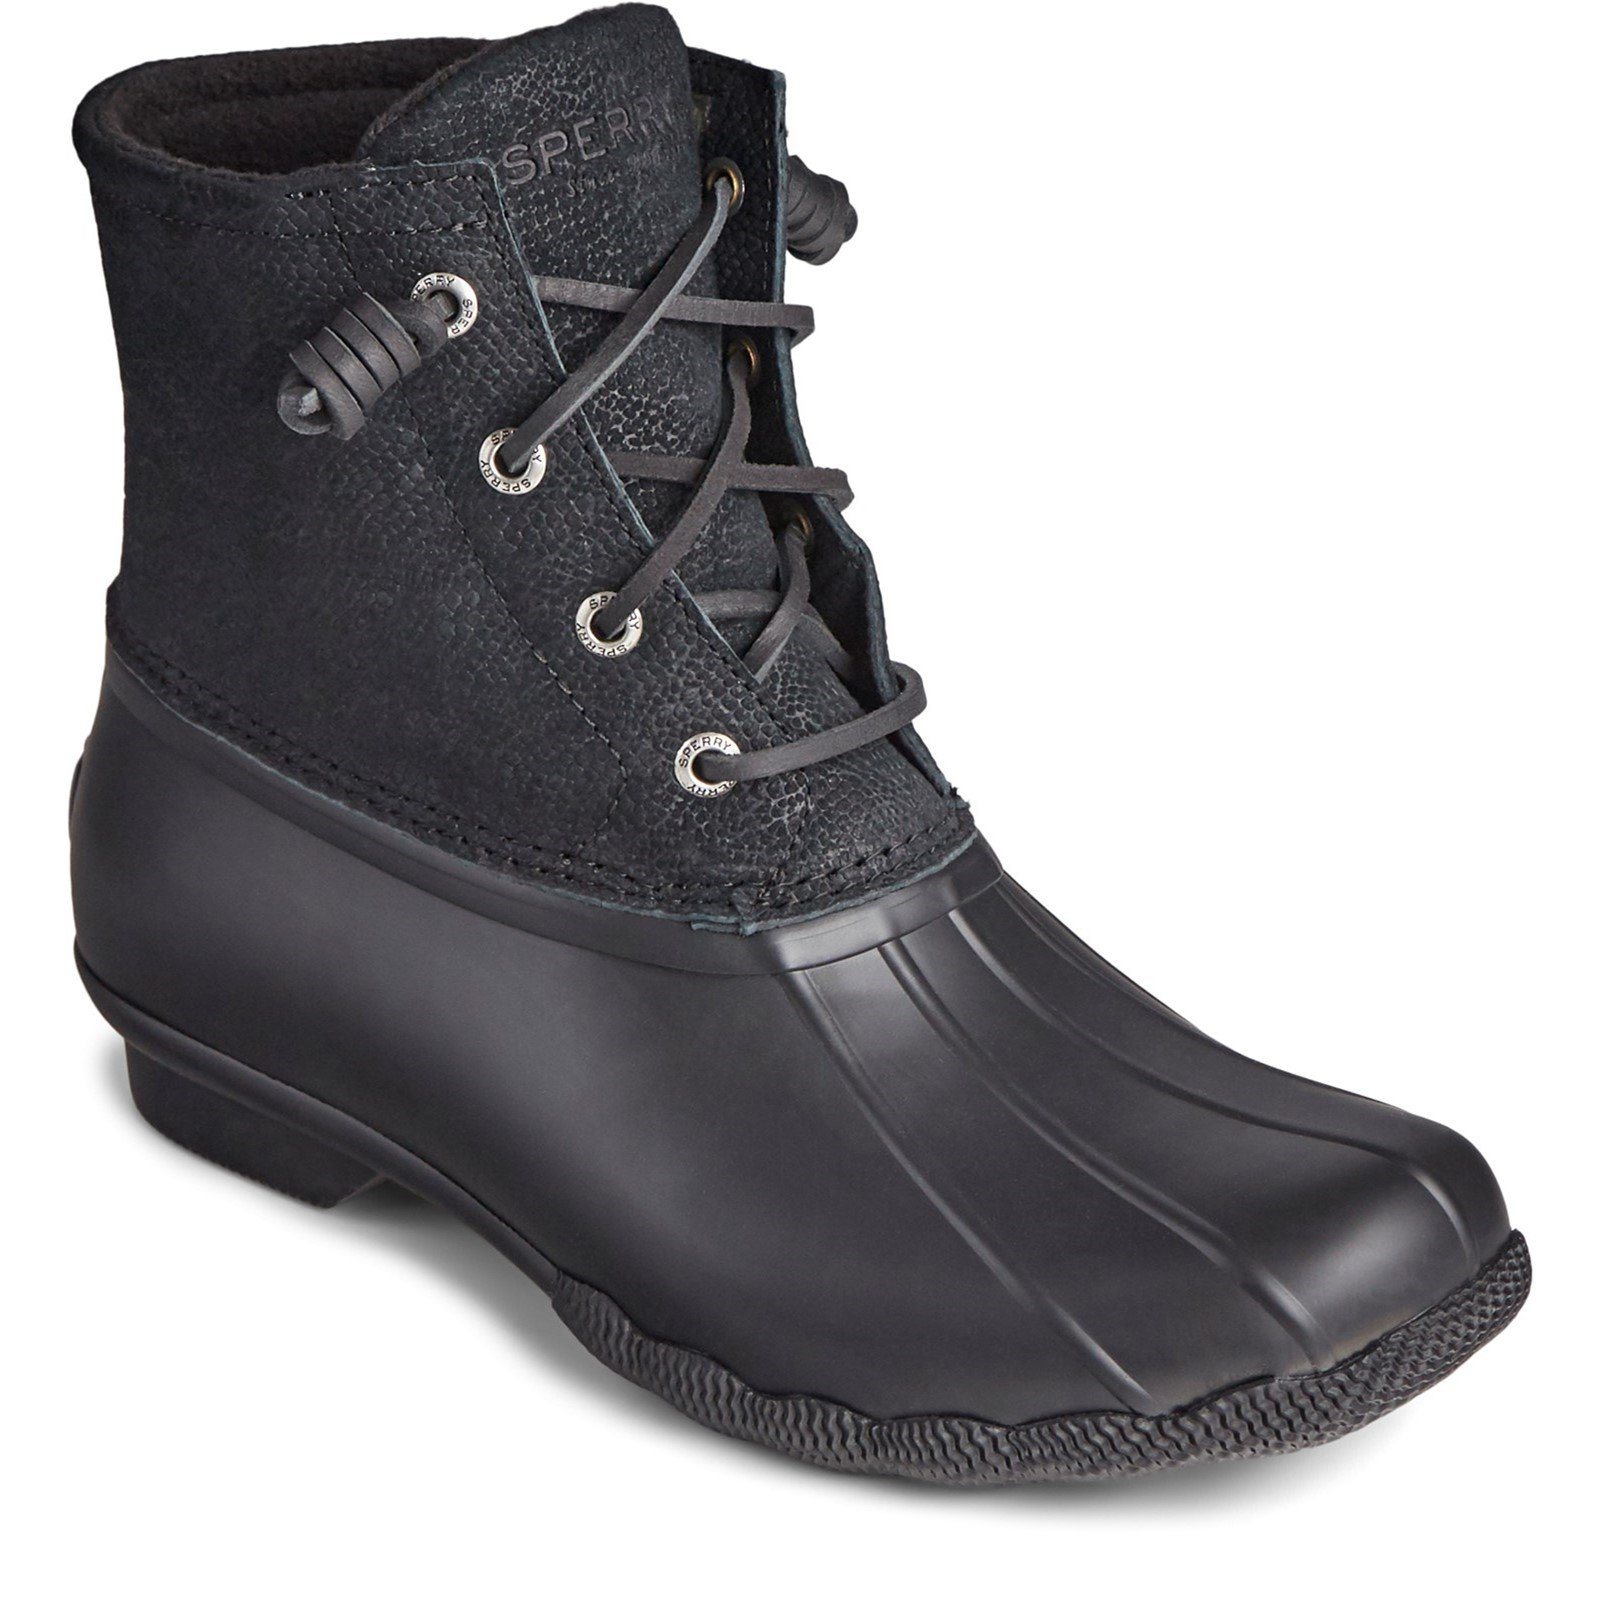 Sperry Women's Saltwater Mid Boot Black 32236 - Black 5